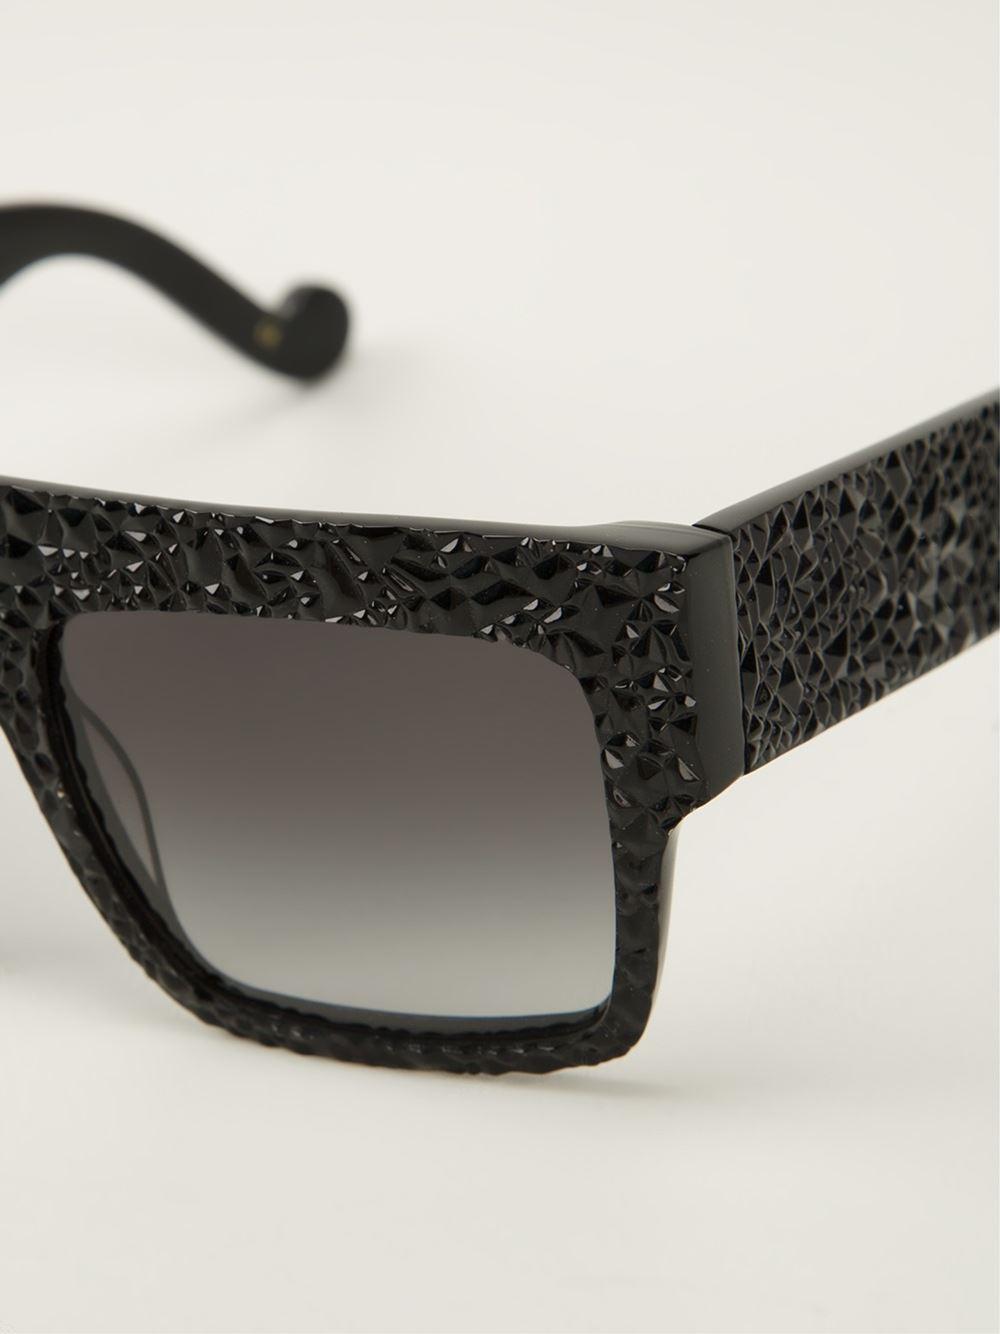 46b81e798a8 Lyst anna karin karlsson am sunglasses in black for men jpg 1000x1334 Anna  karin karlsson eyewear